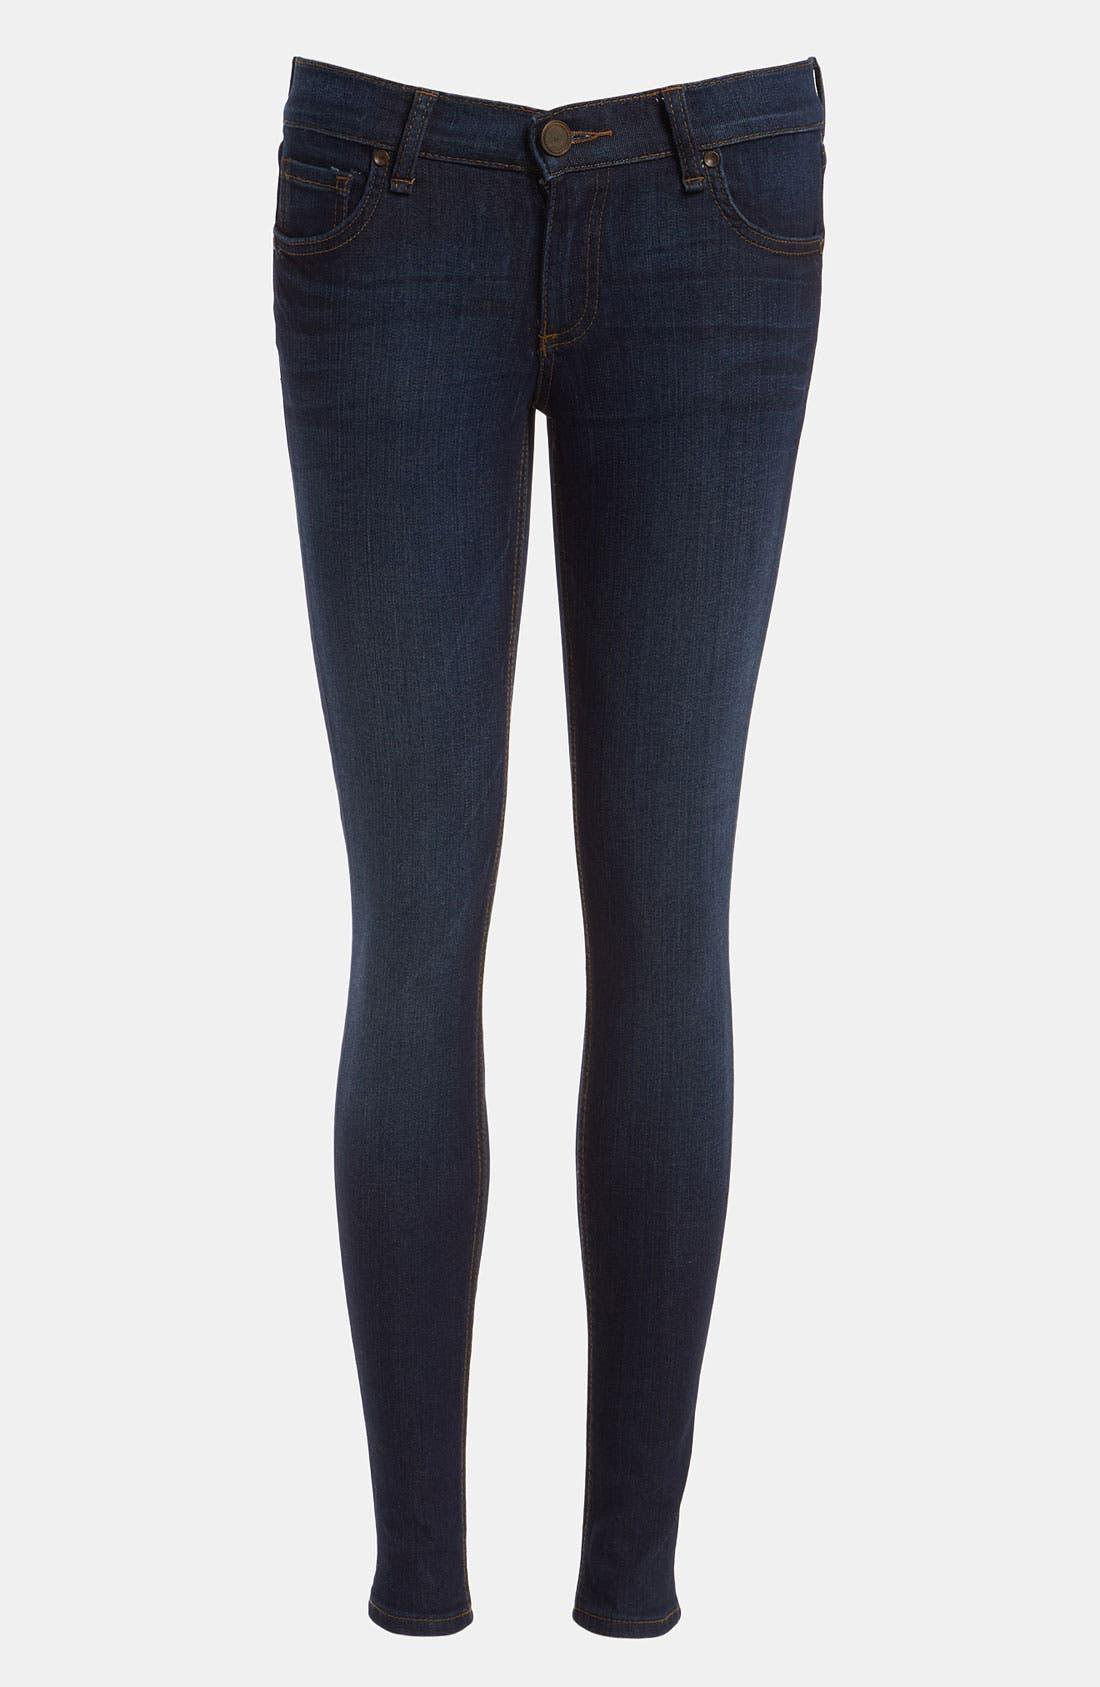 'Sloan' Skinny Jeans, Main, color, 400